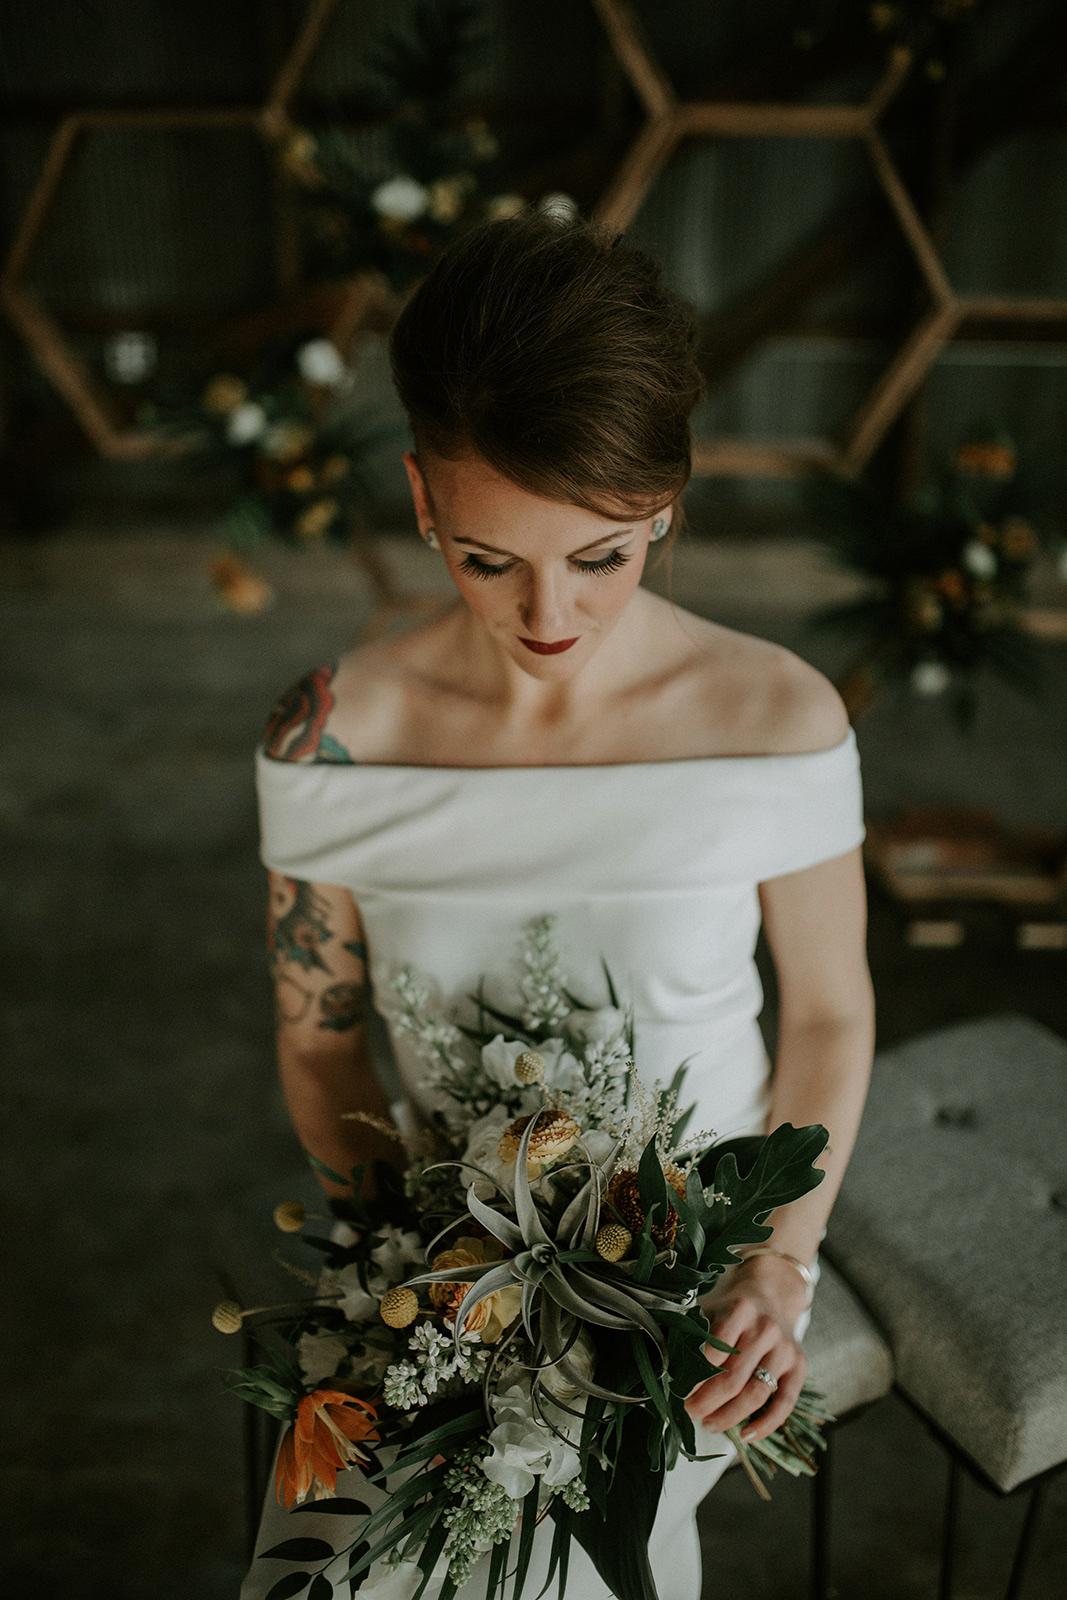 bluestem_hall_champaign_wedding_photographer_wright_photographs_collaboration_0132.jpg